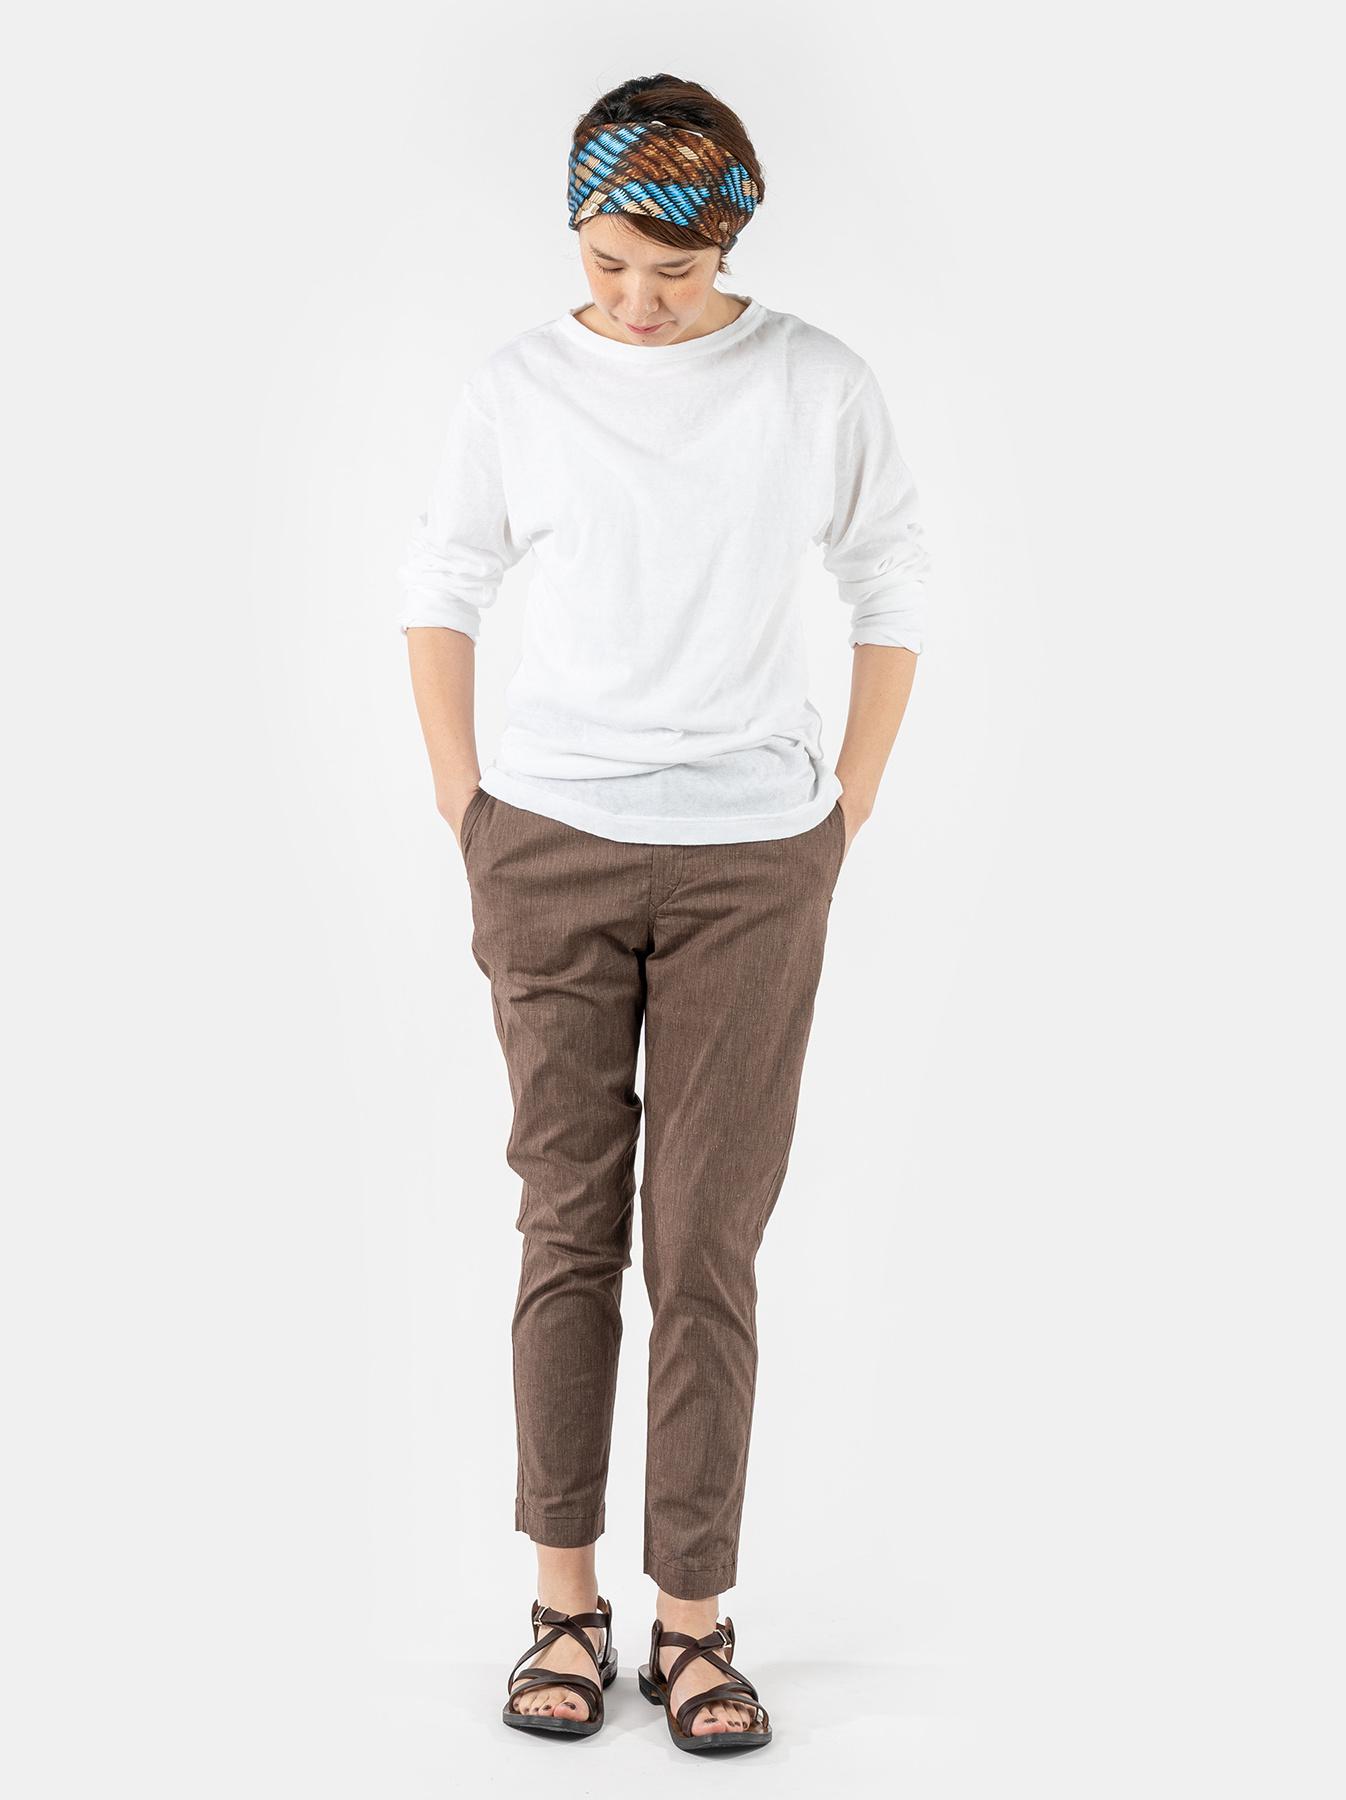 WH Cotton Linen Hakeme Stretch Pants-2